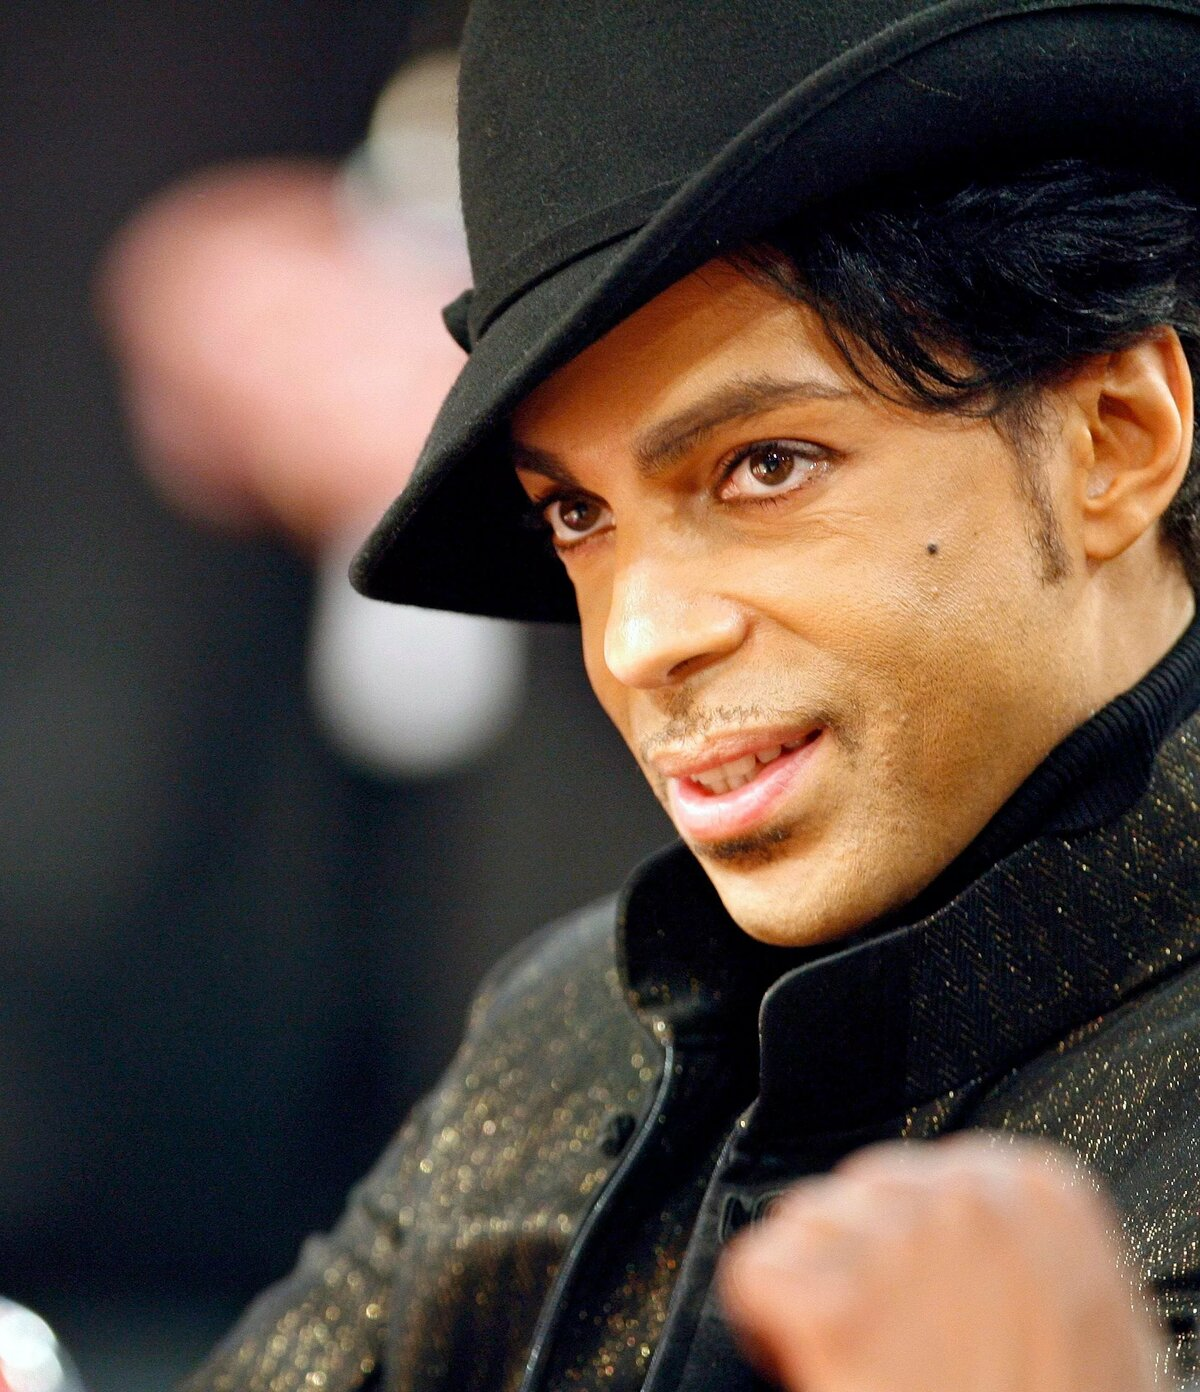 близкое принц певец сейчас фото мотивах